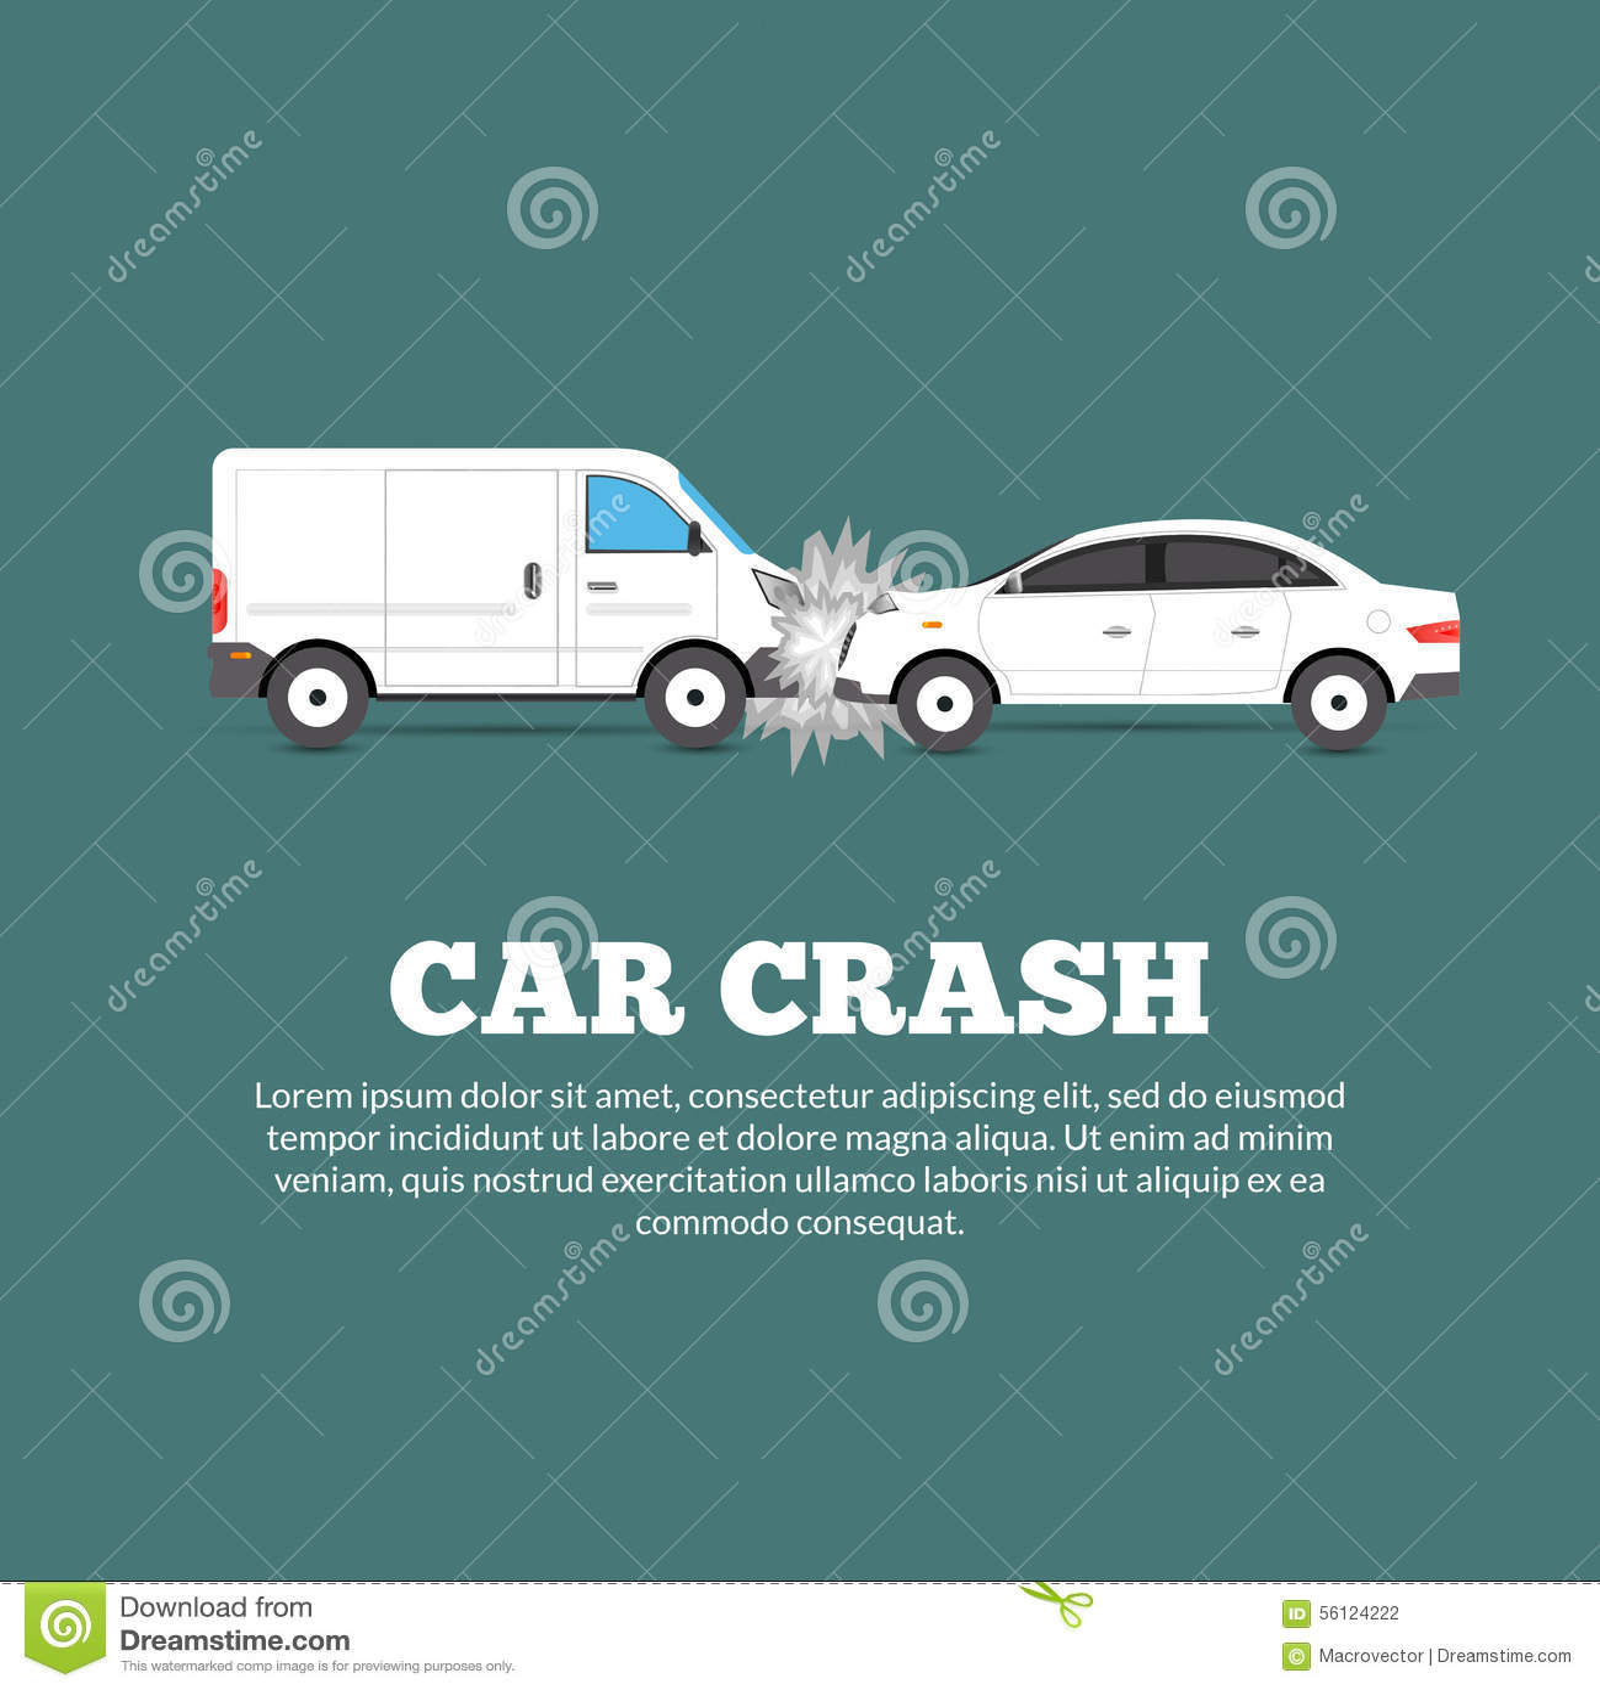 Home Design 3d Keeps Crashing: Car Crash Poster Stock Vector